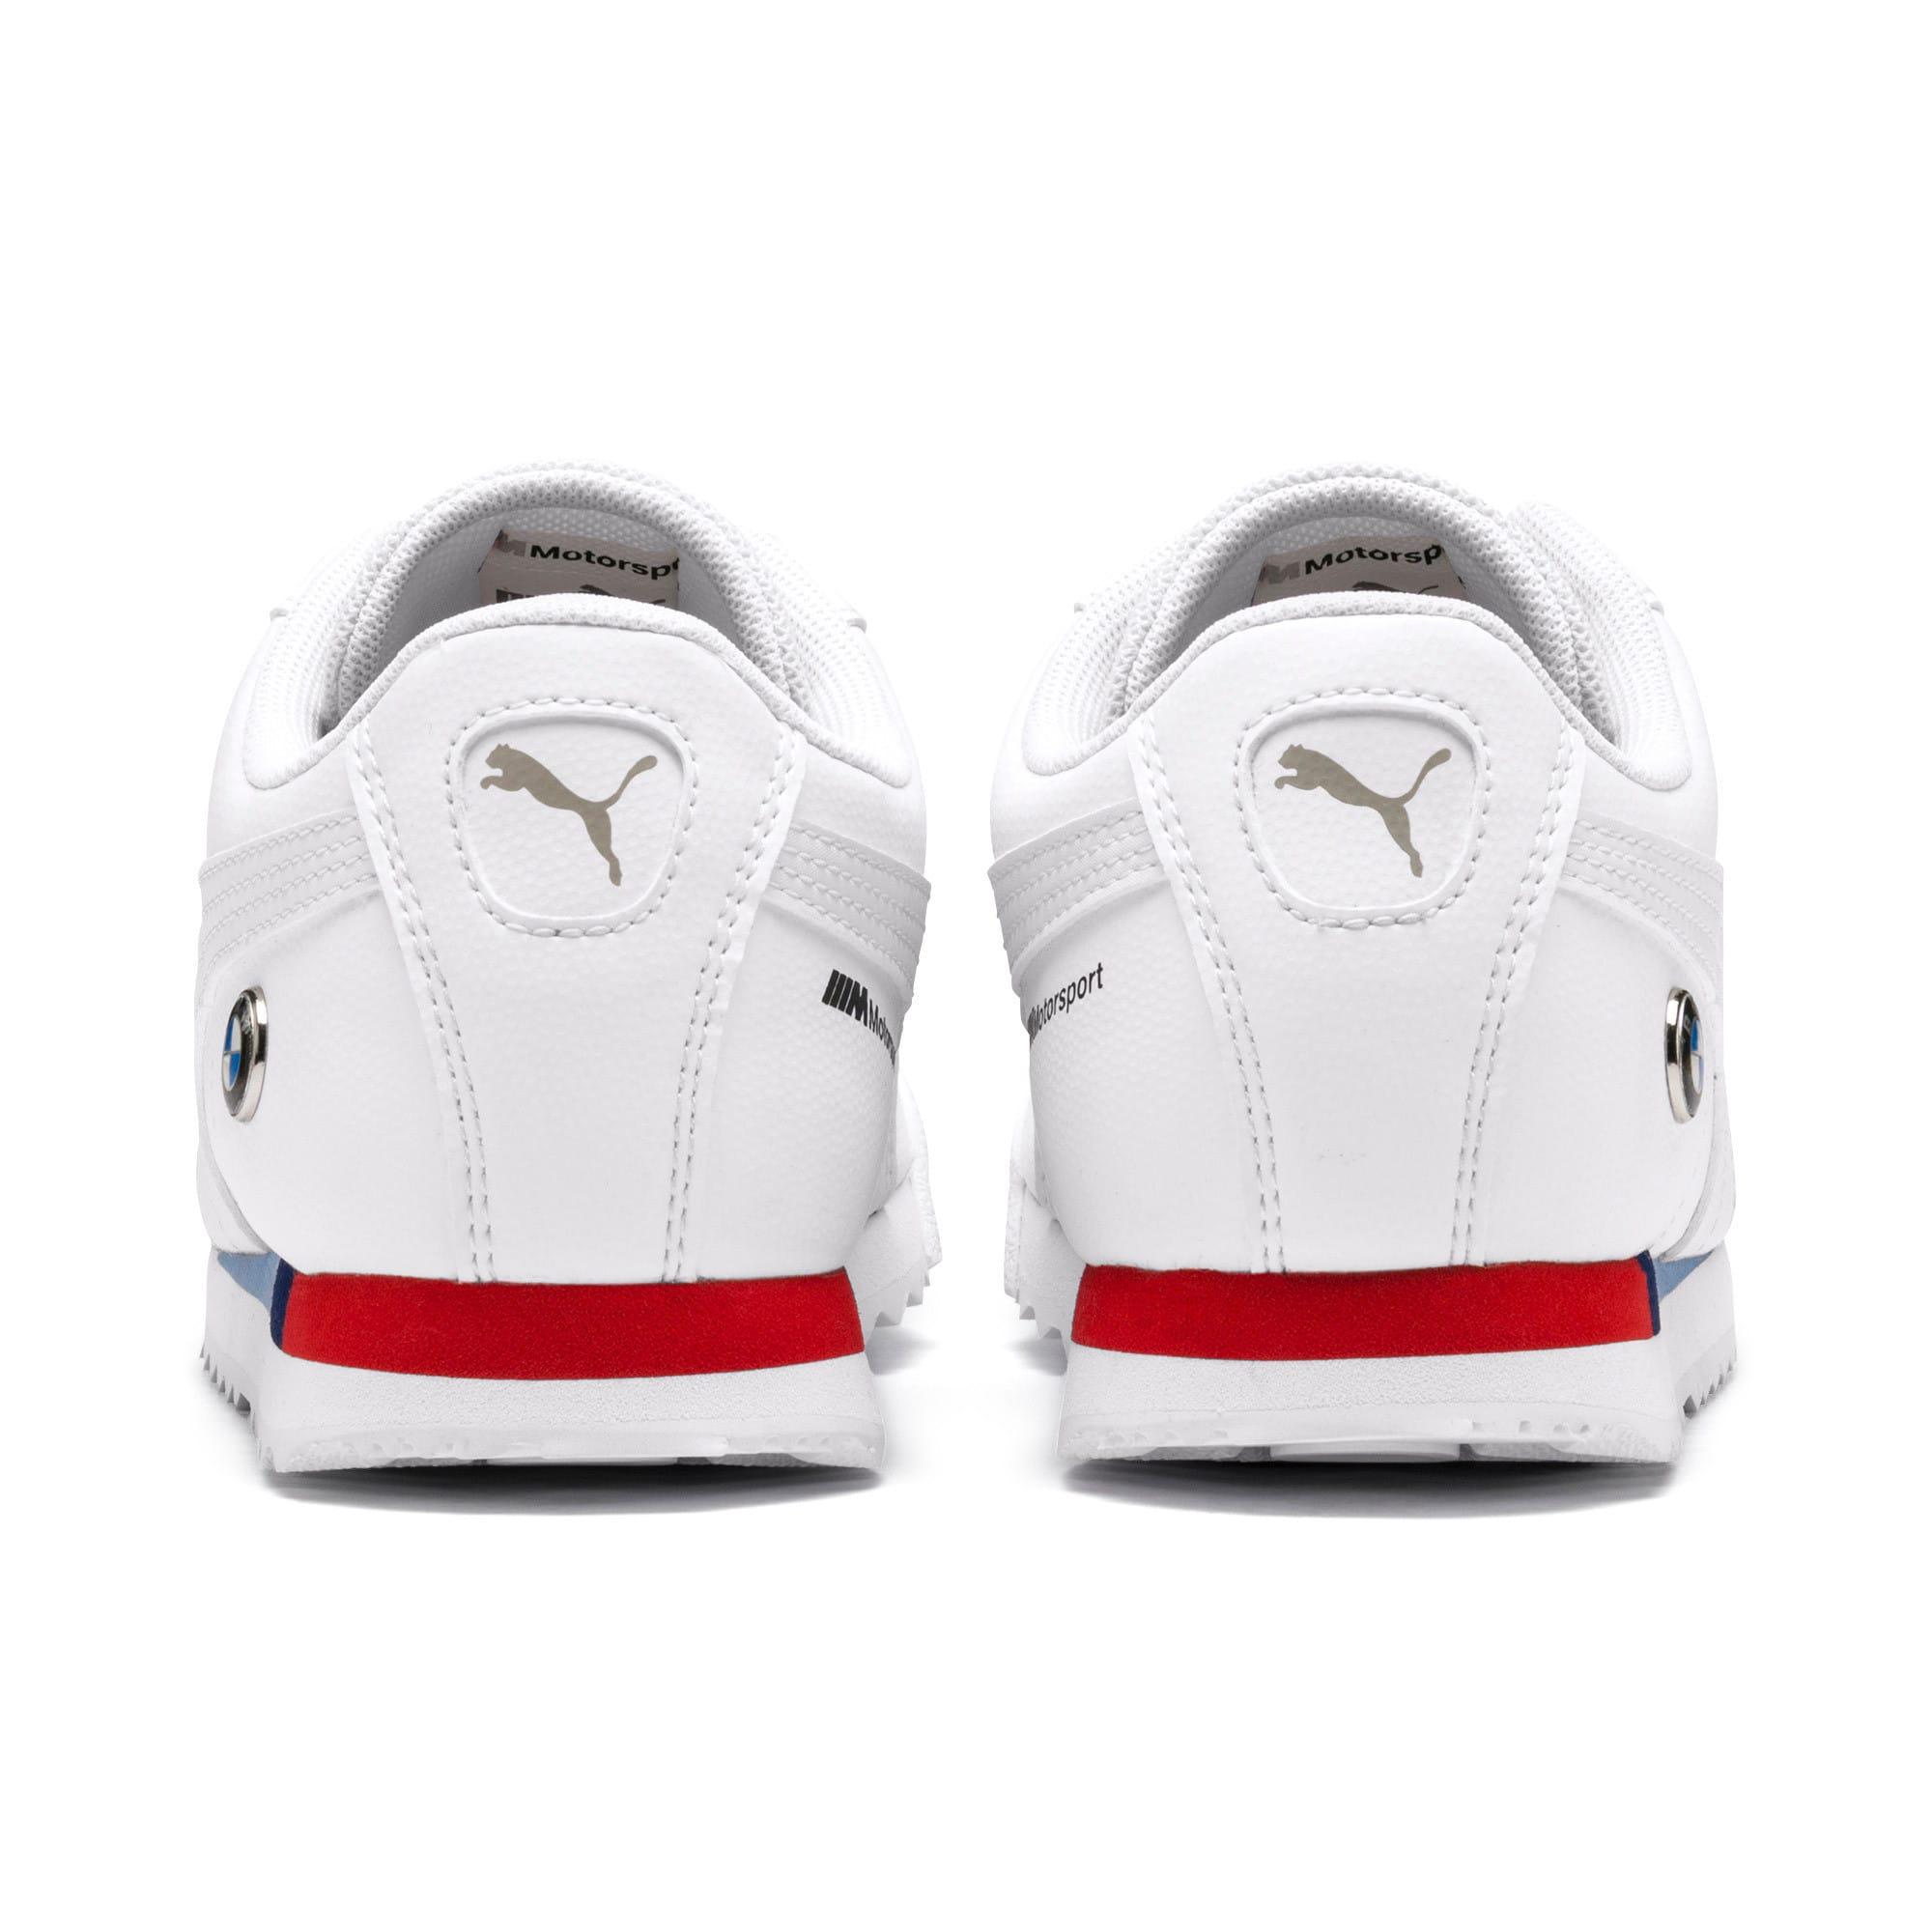 Thumbnail 4 of BMW M Motorsport Roma Sneakers JR, Puma White-Puma White, medium